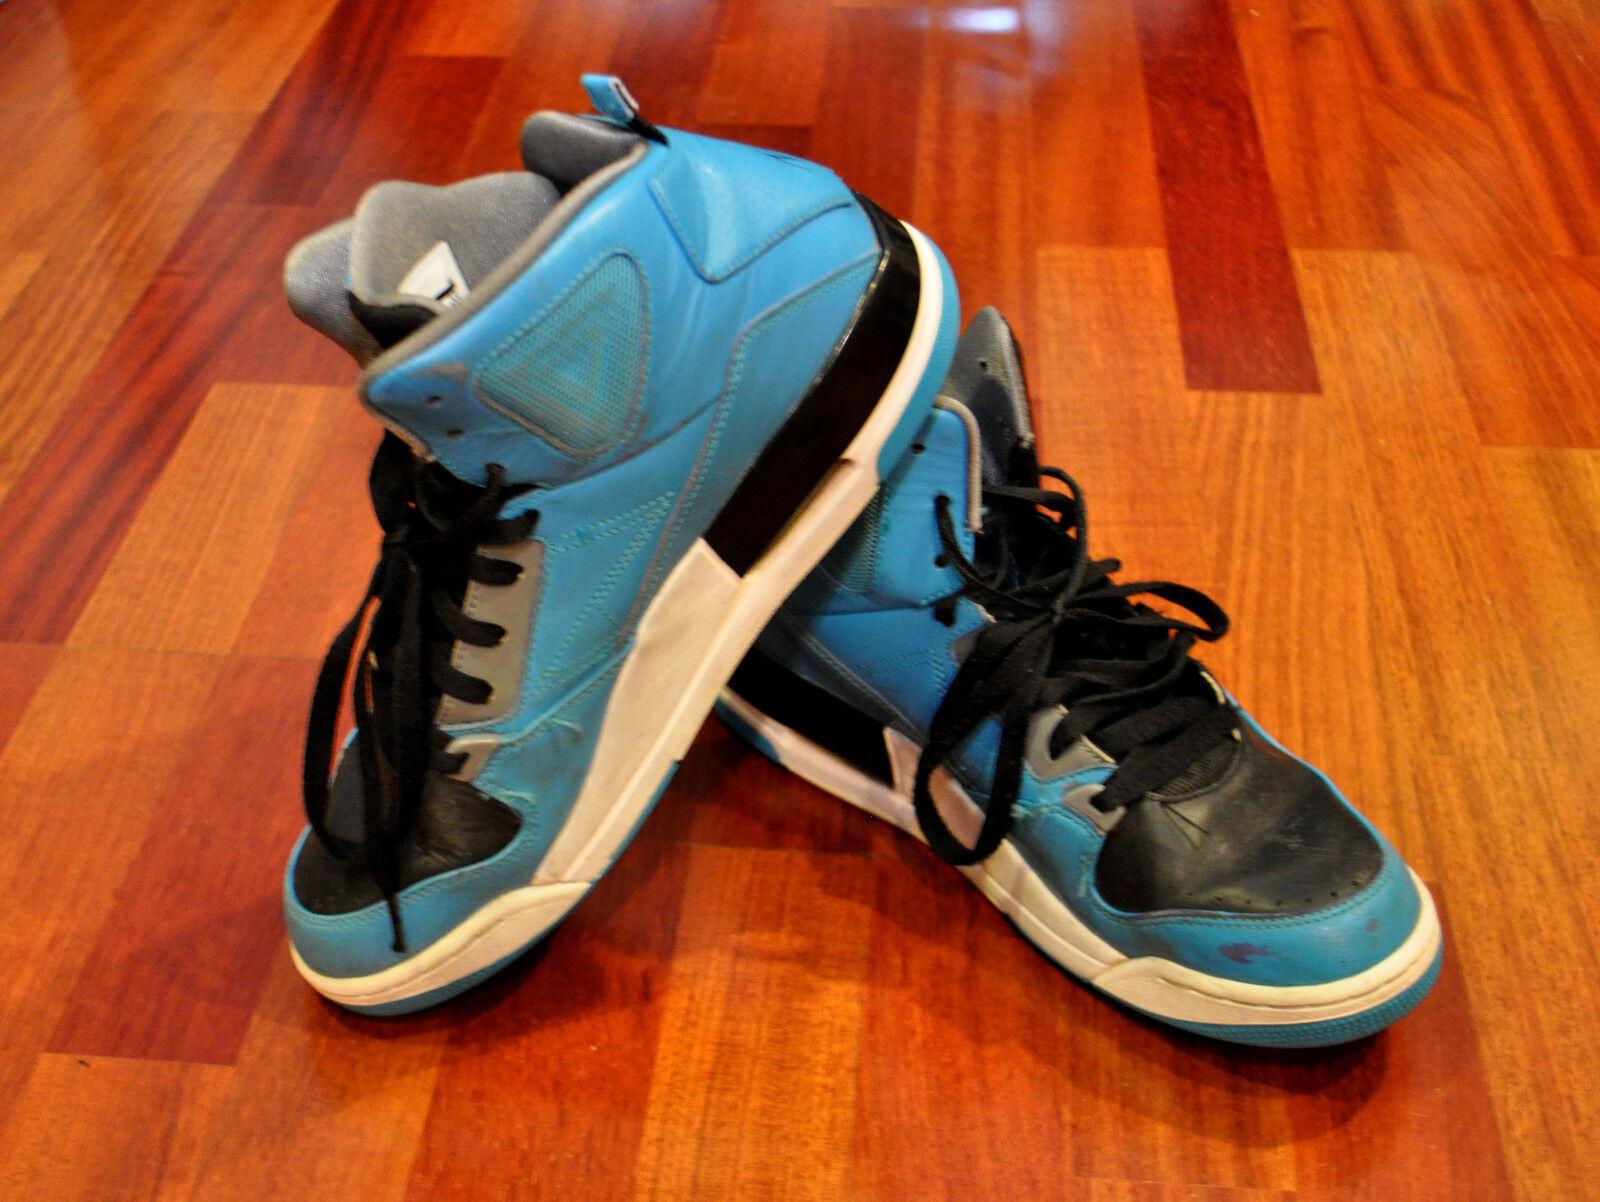 Nike jordan volo hightop scarpe 629877 bianco nero nero nero blu grigio sz 9,5 | Esecuzione squisita  | On-line  | elegante  a46941